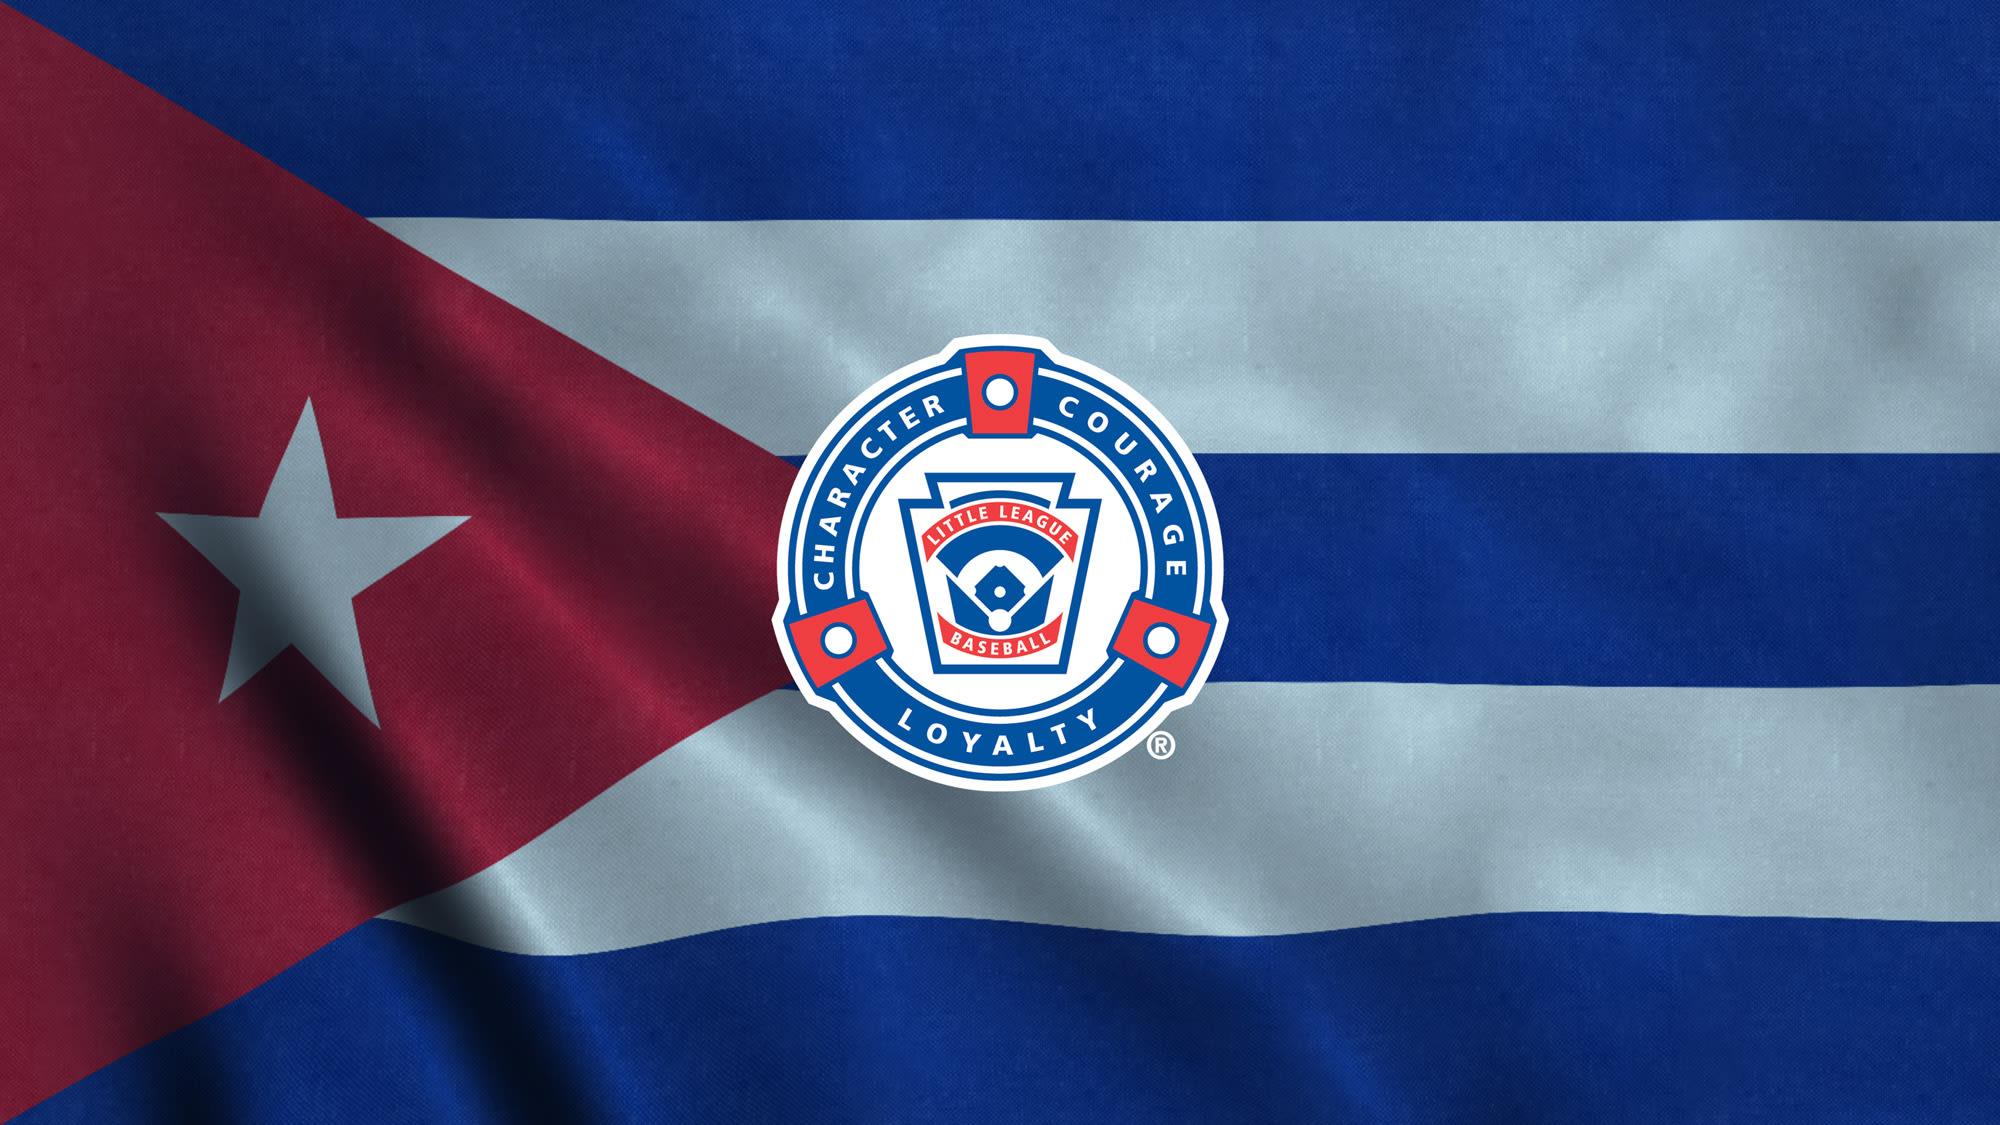 cuba-flag-ll-logo